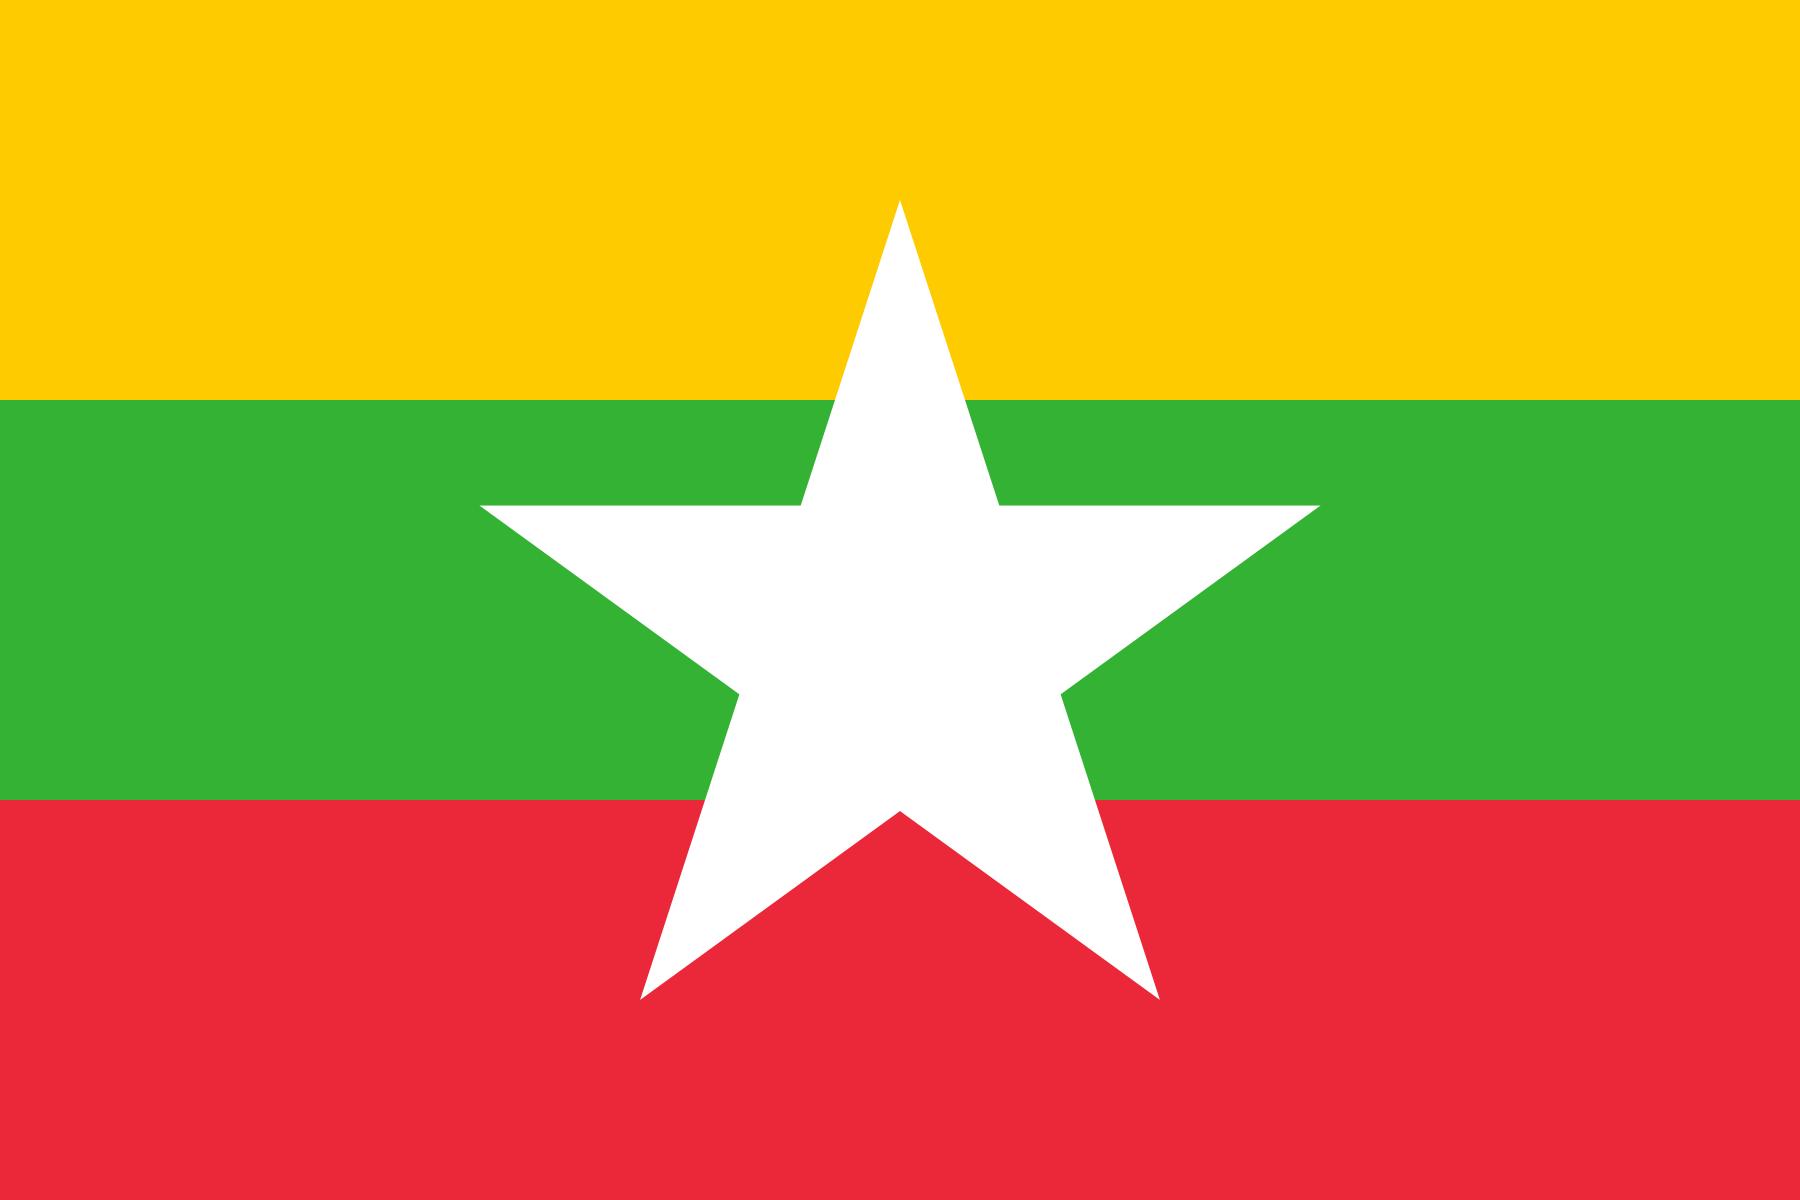 Drapeau Birmanie – Le drapeau birman